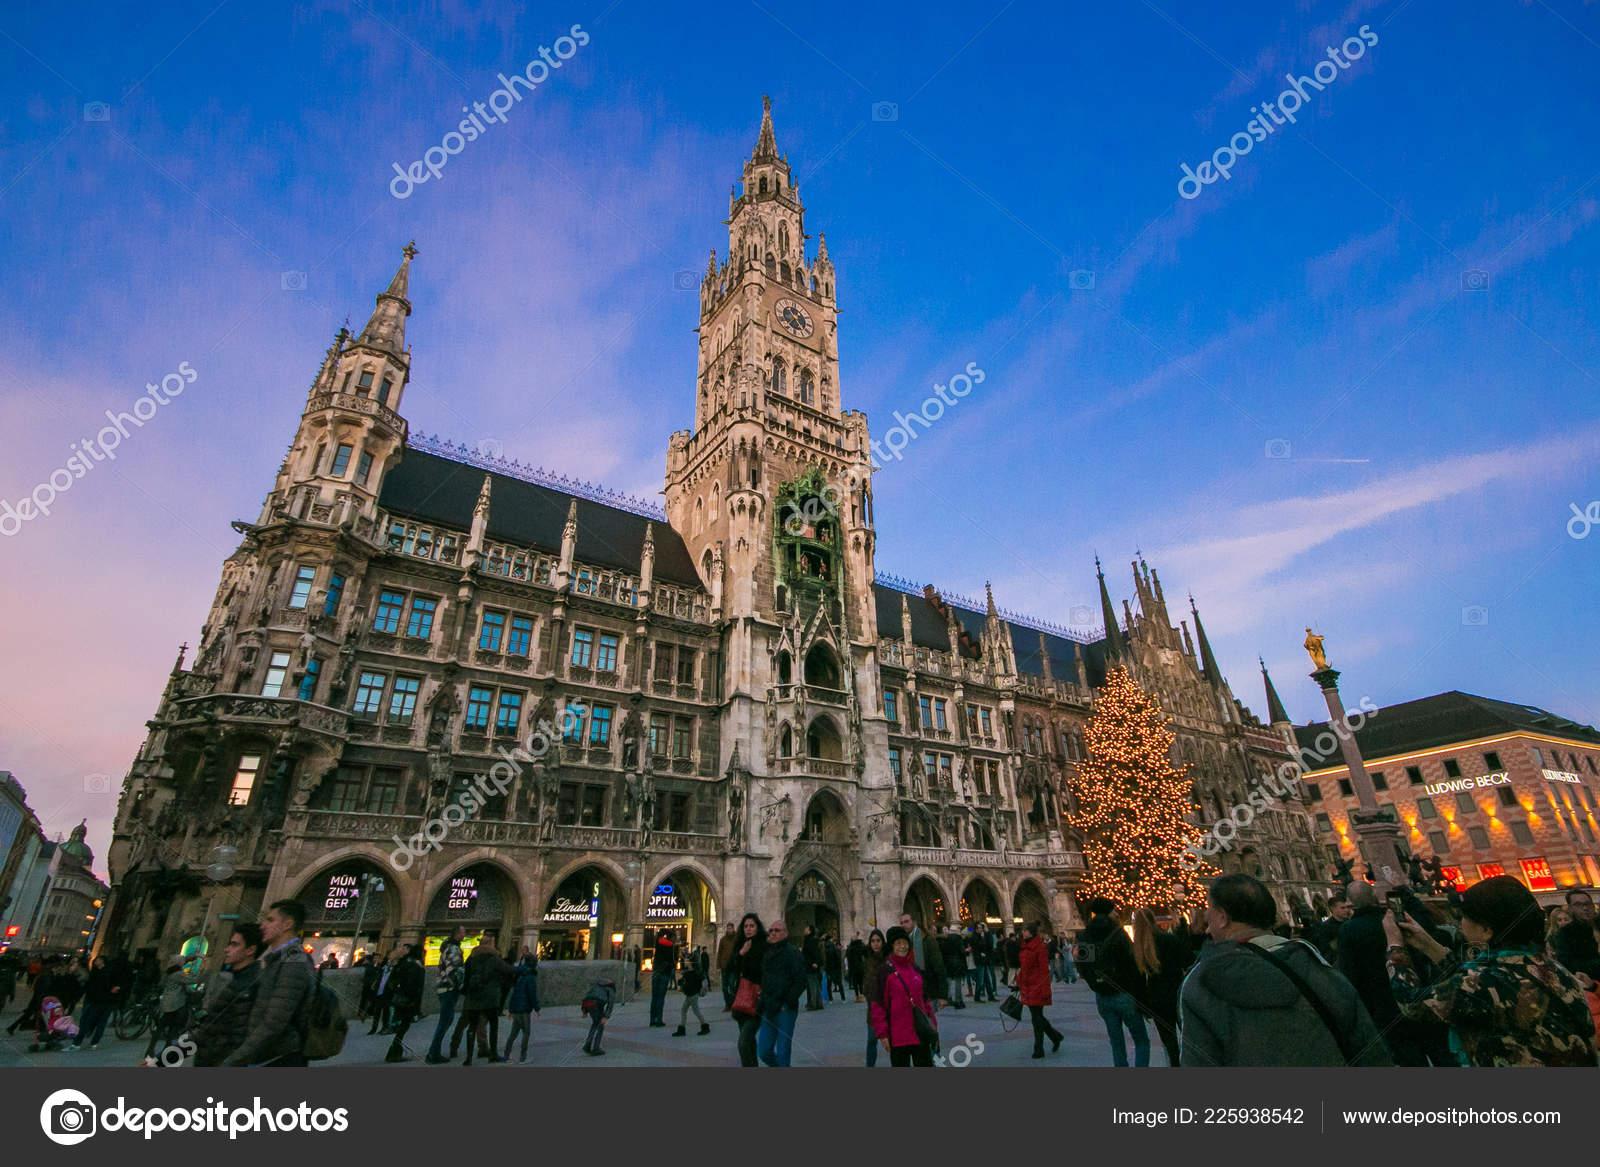 Munich Germany Christmas.Munich Germany December 2017 Marienplatz Christmas Tree